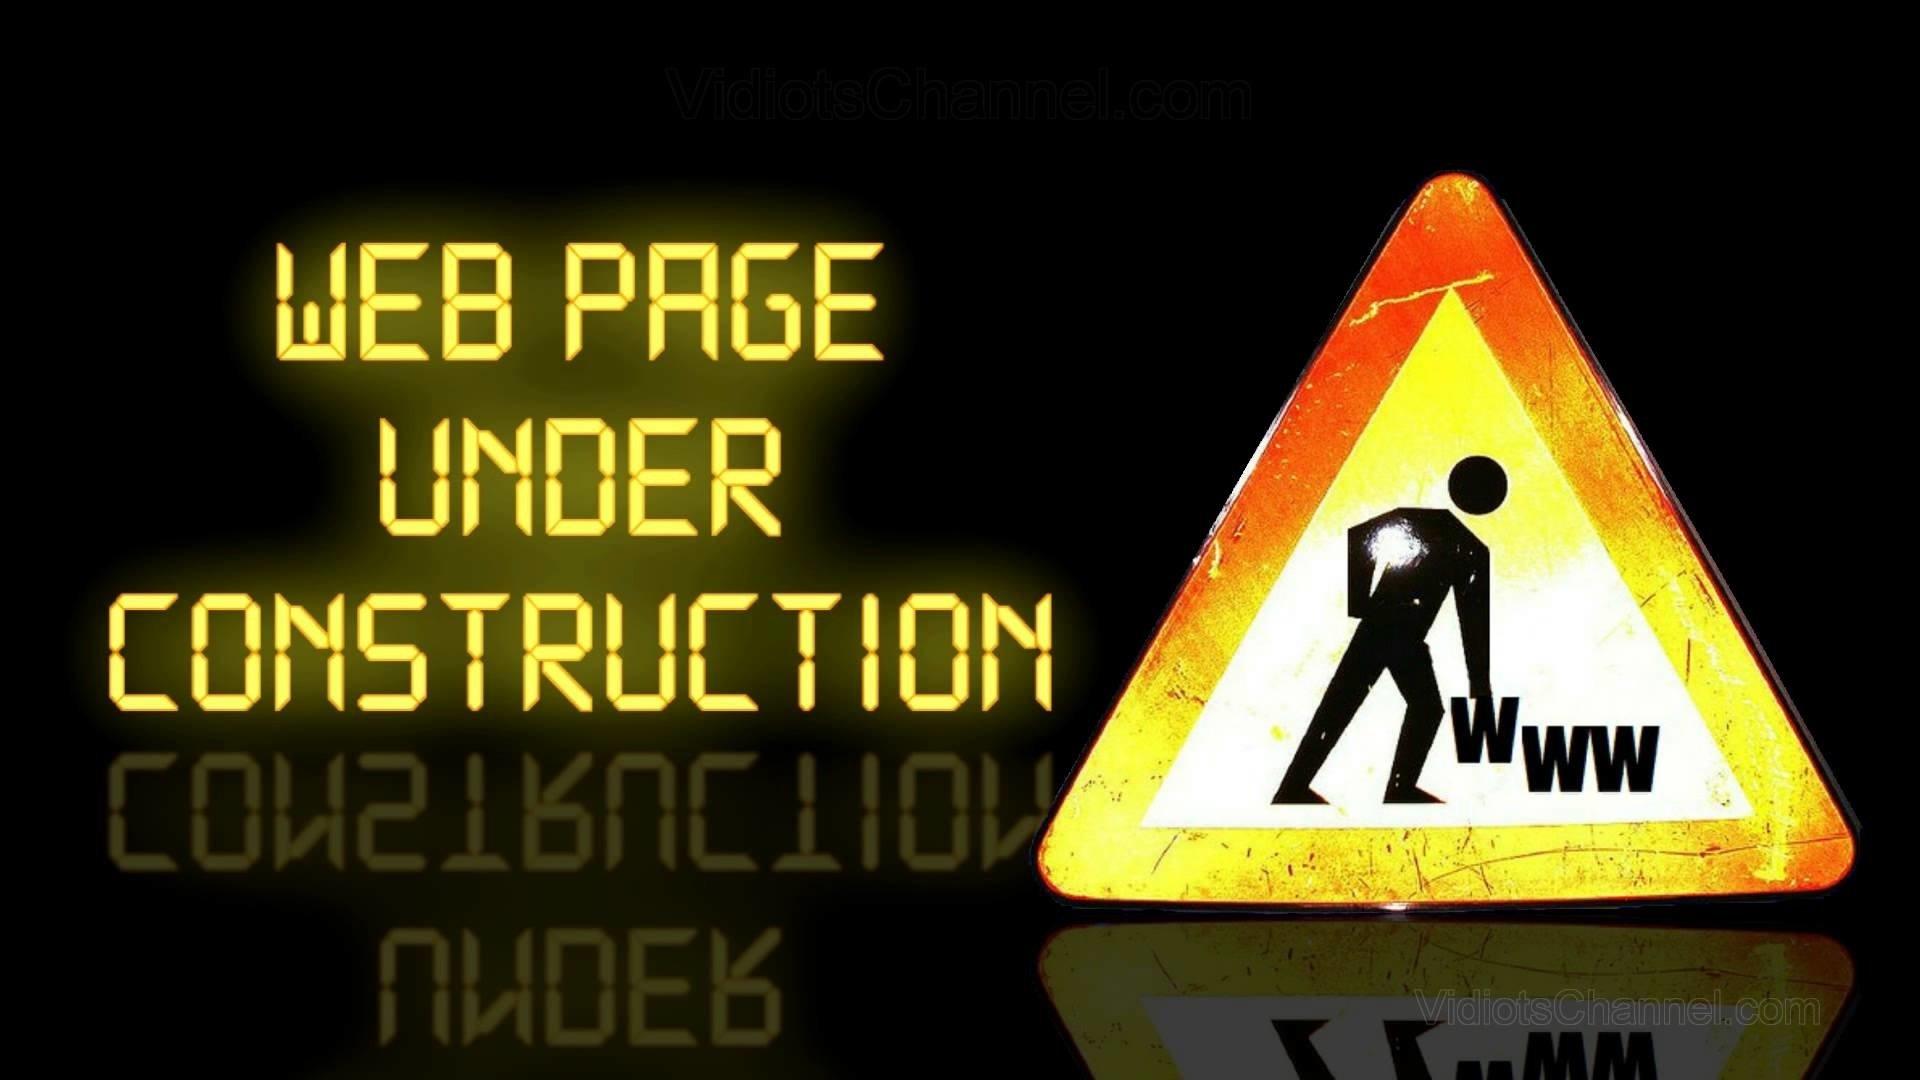 website under construction hd wallpaper | background image